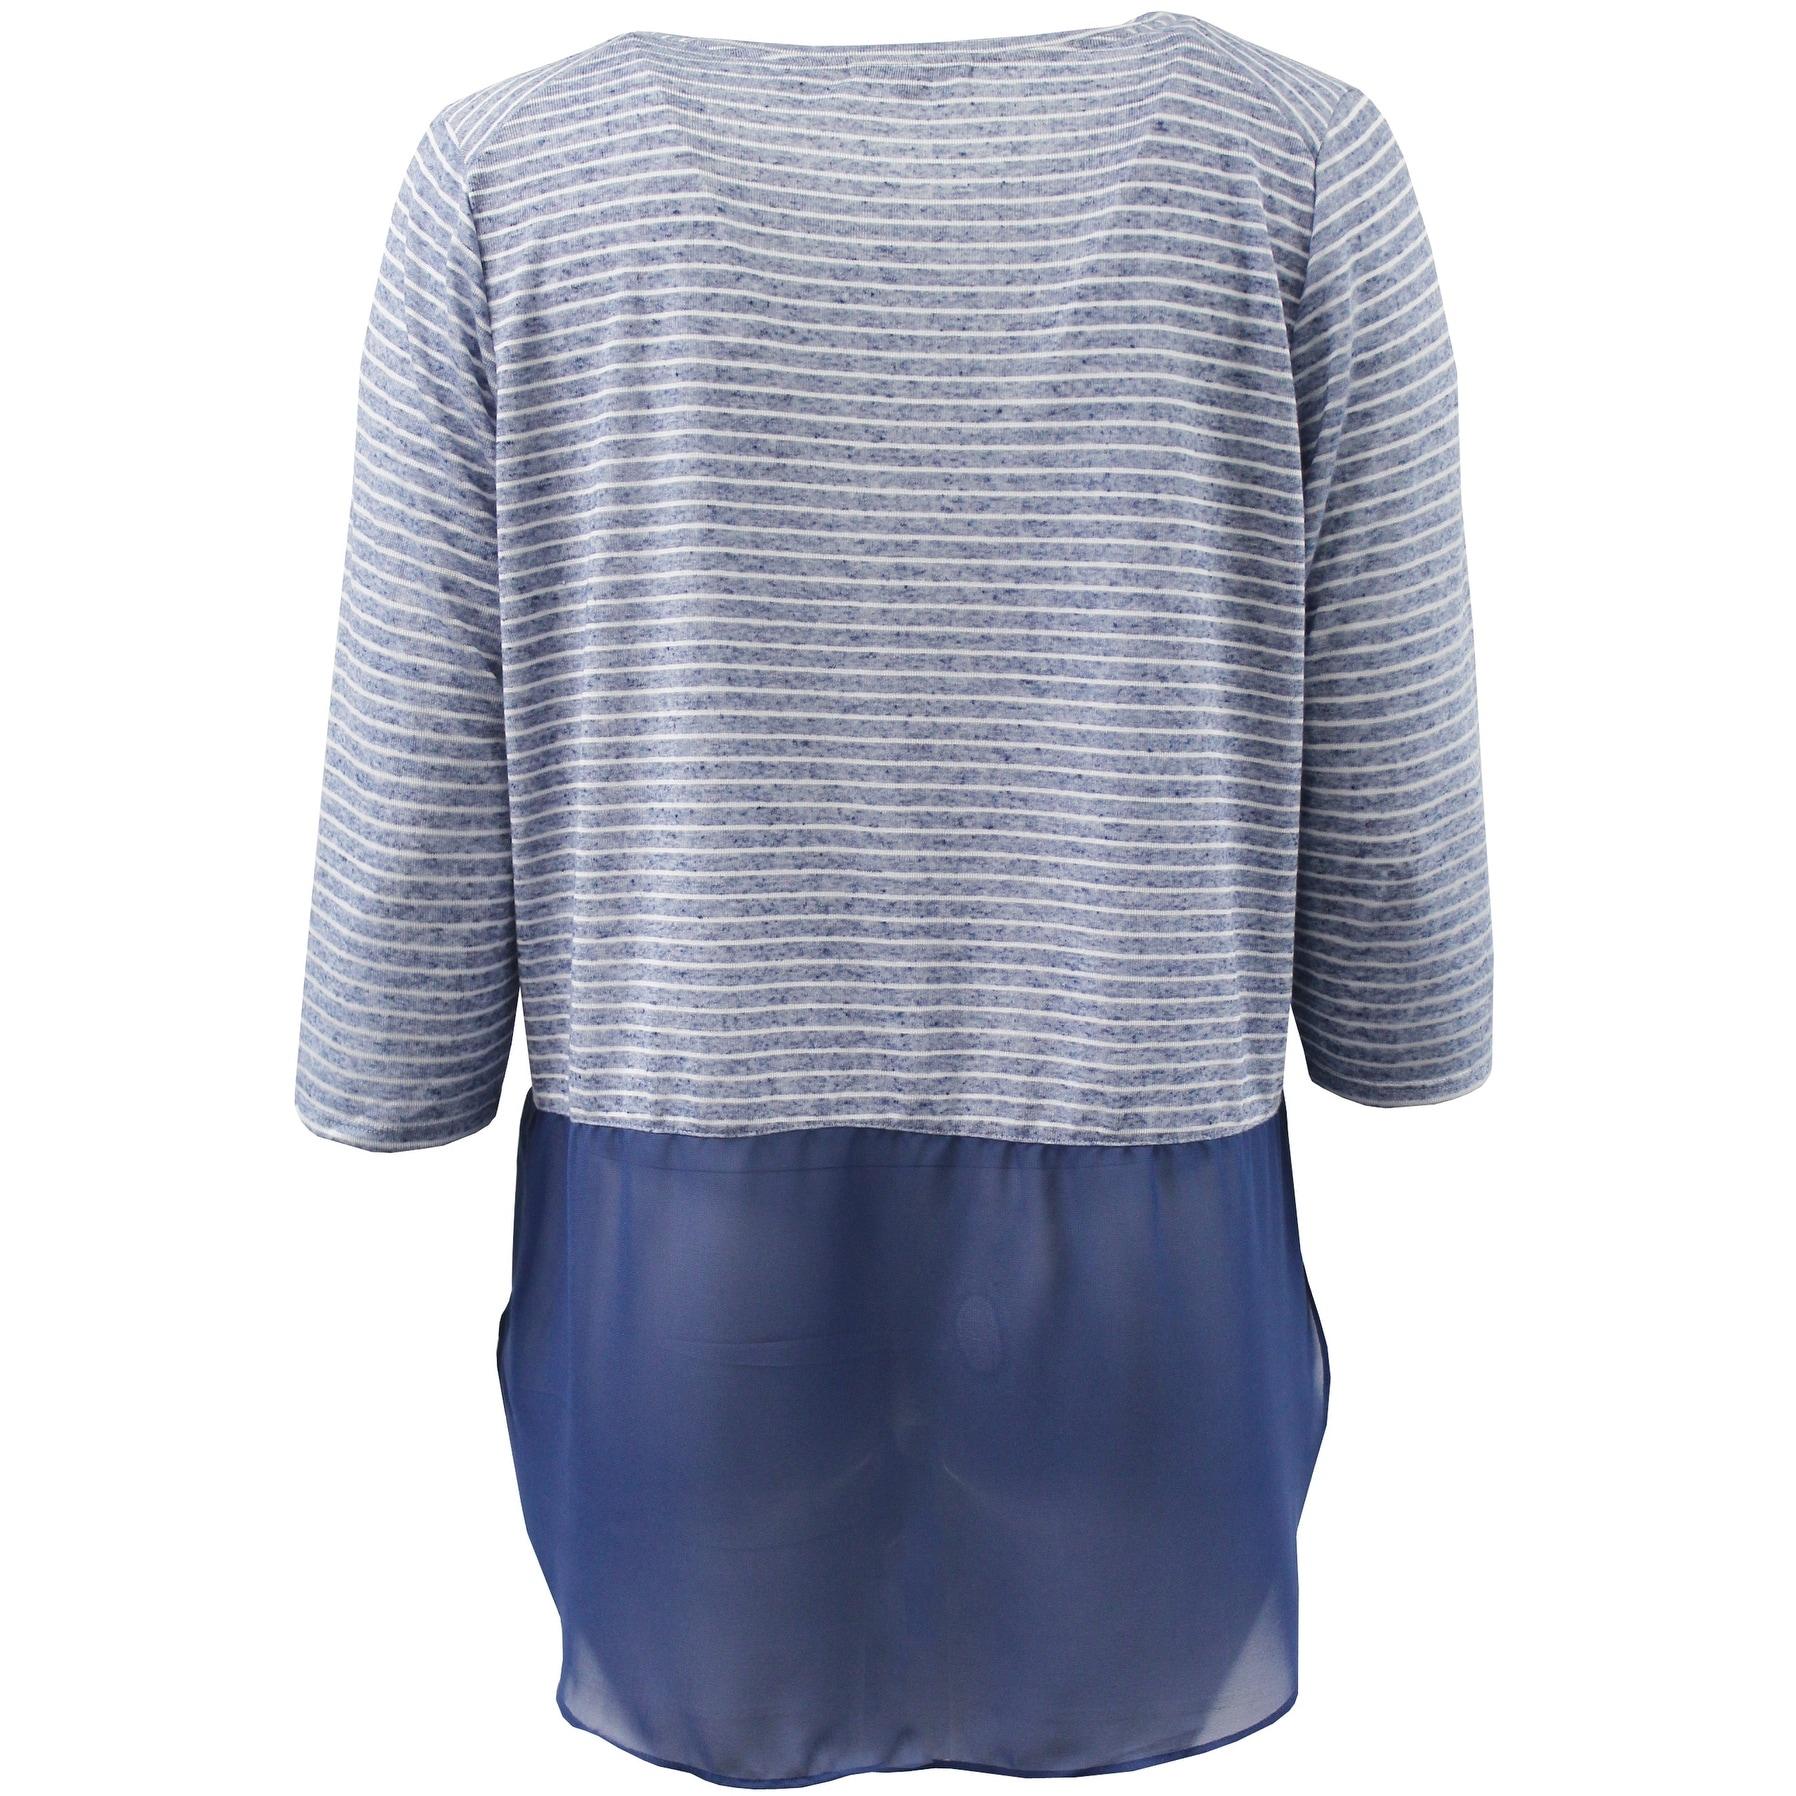 08e03f27 Women - Plus Size 3/4 Sleeve Striped Chiffon Bottom Top Blouse Knit Shirt  Blue White